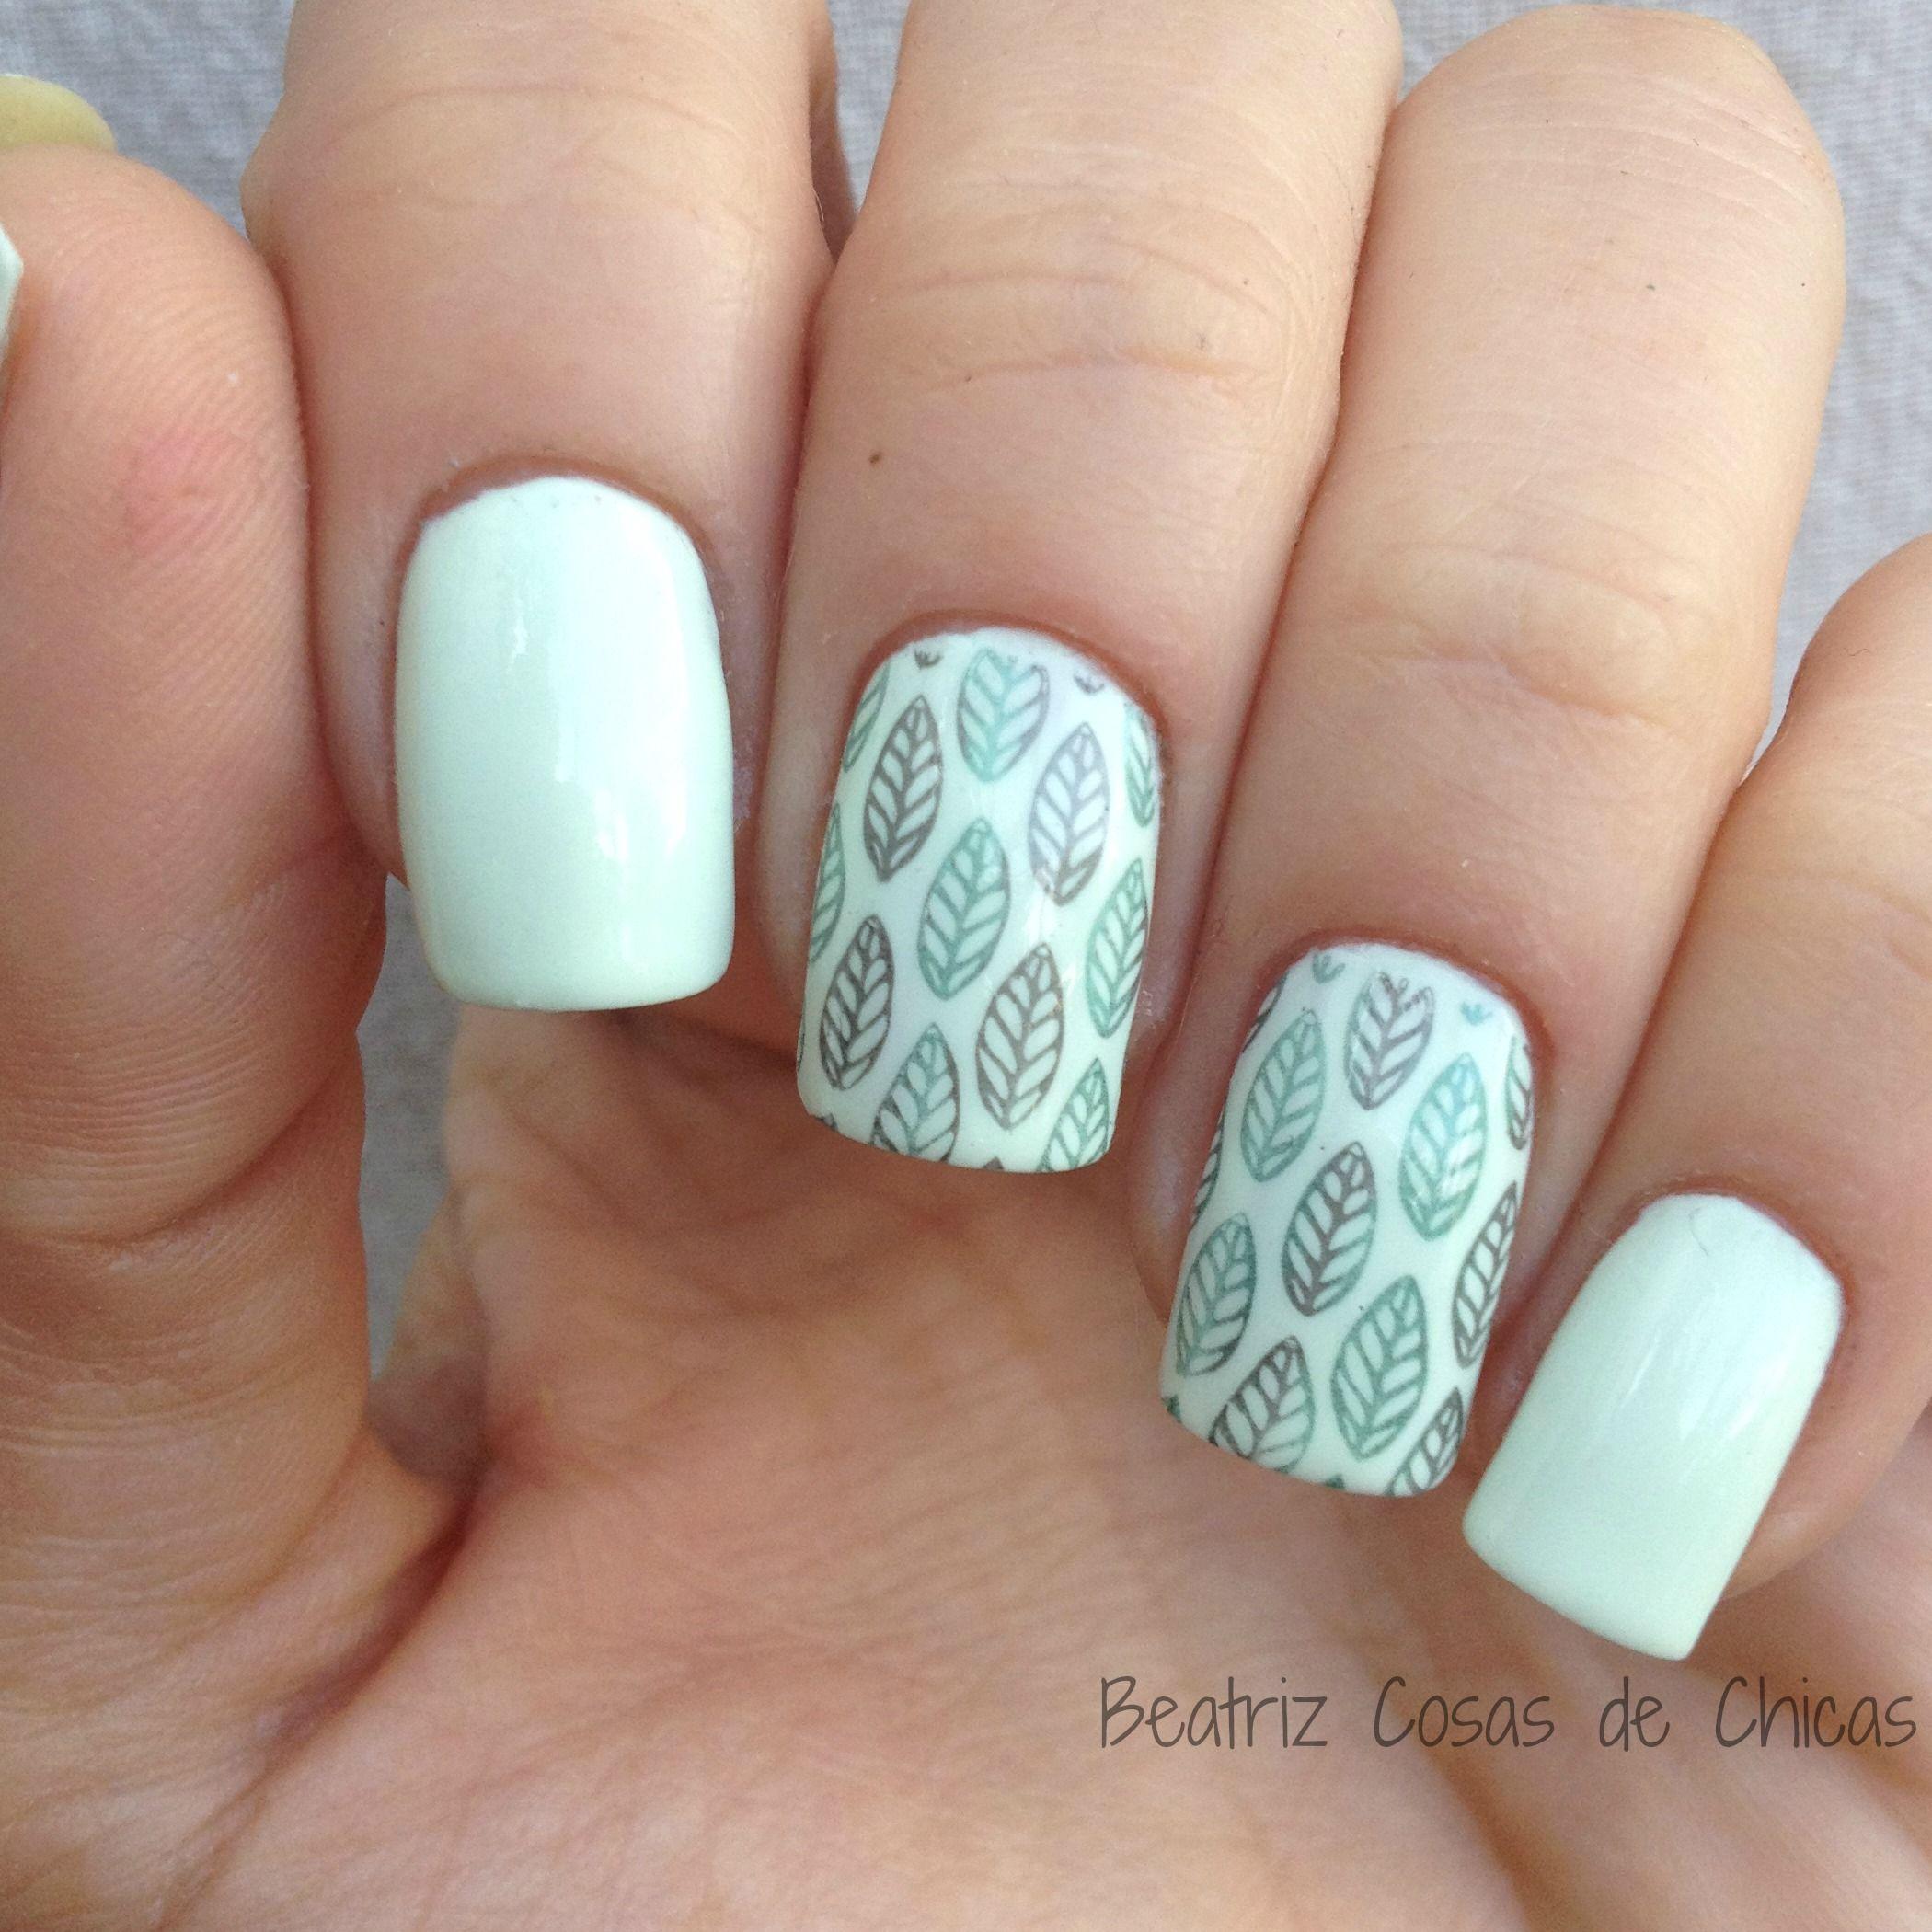 Verde Menta Kiss de Essence y Curali.2 | Nails | Pinterest | Verde ...